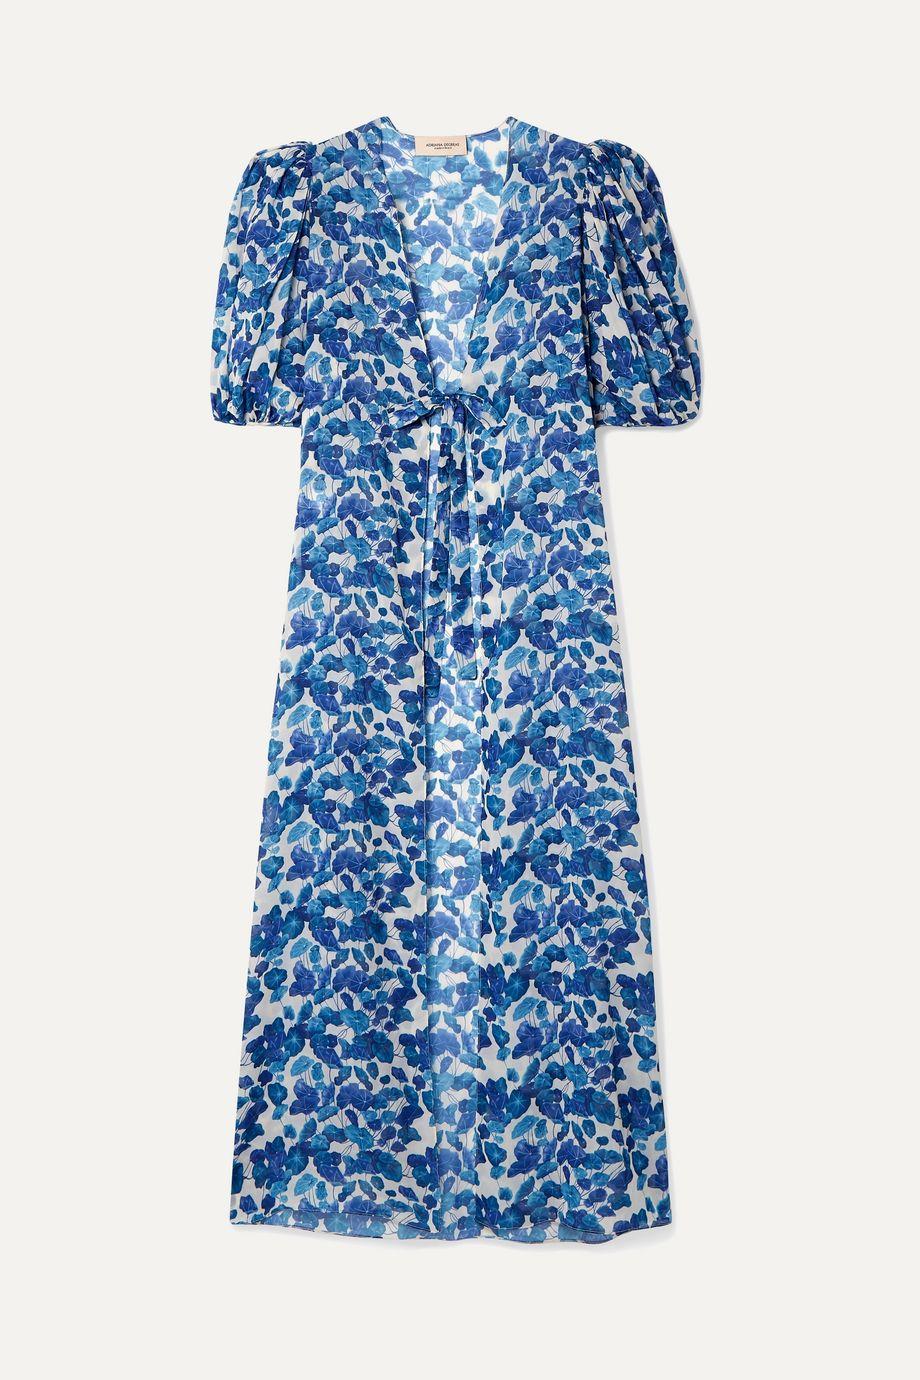 Adriana Degreas Floral-print chiffon robe